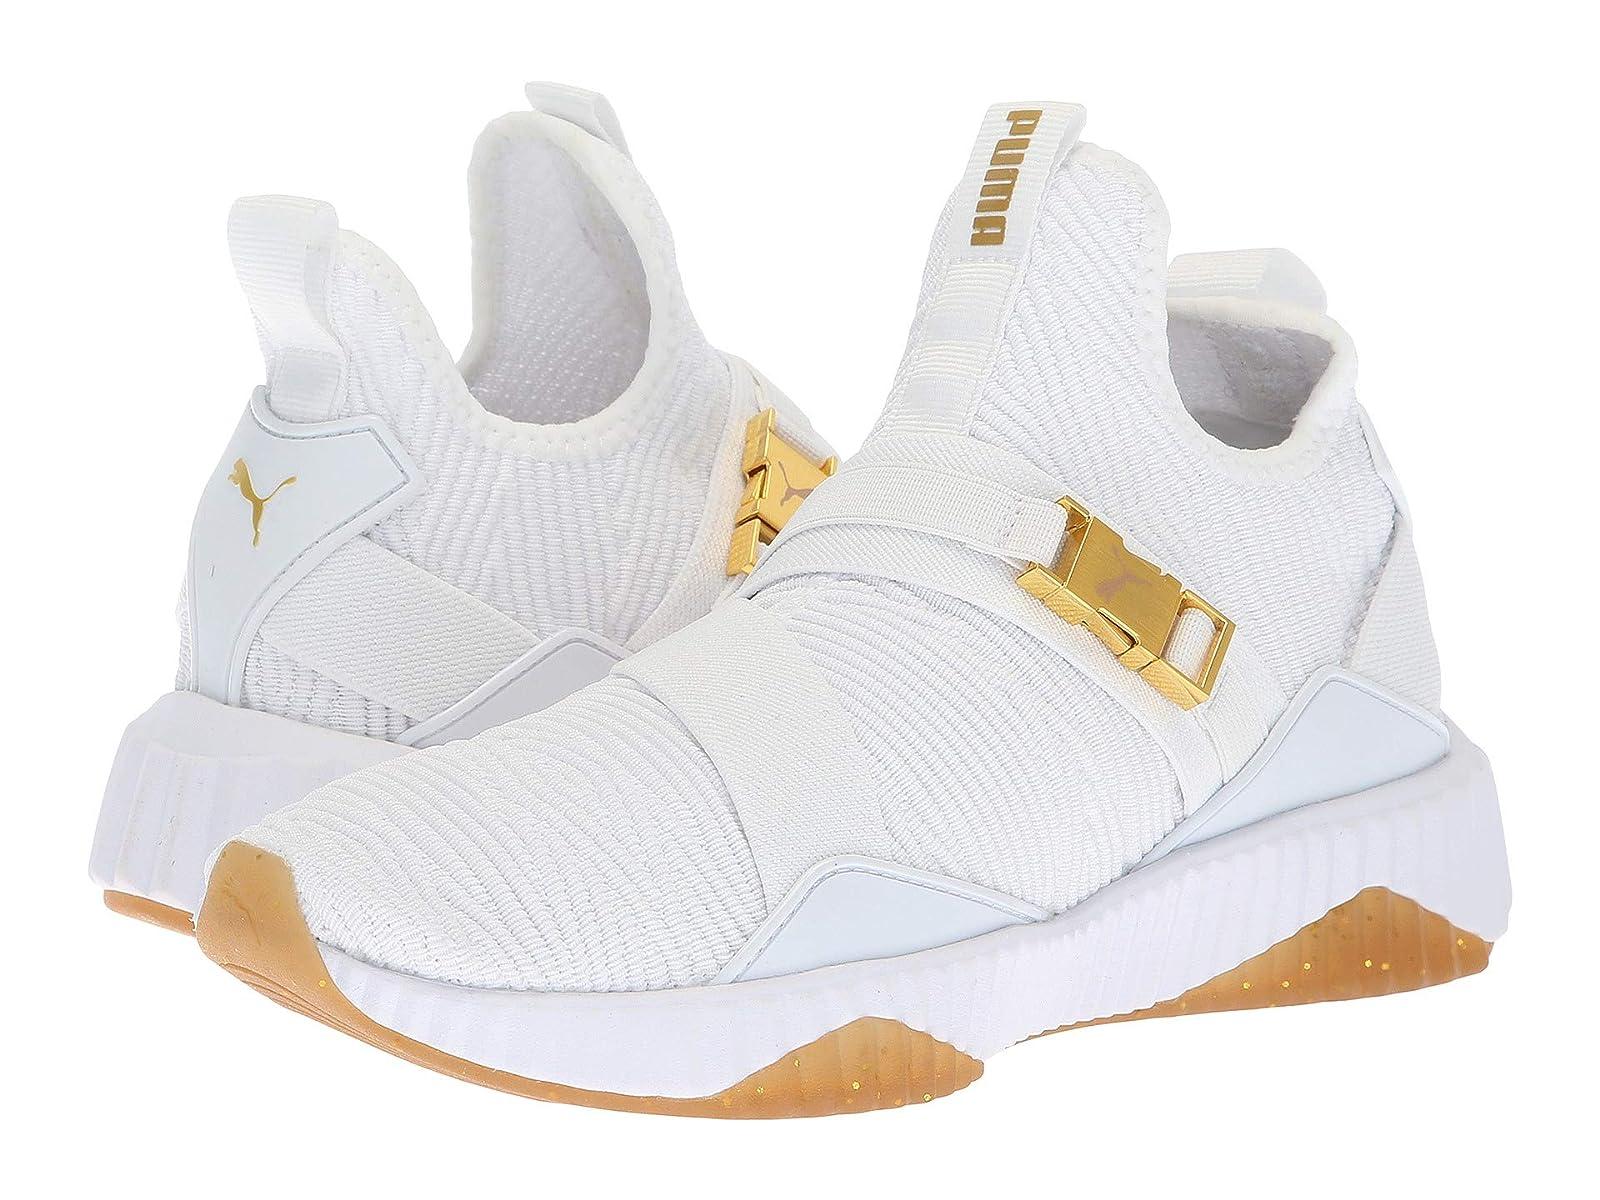 PUMA Defy Mid VarsityAtmospheric grades have affordable shoes